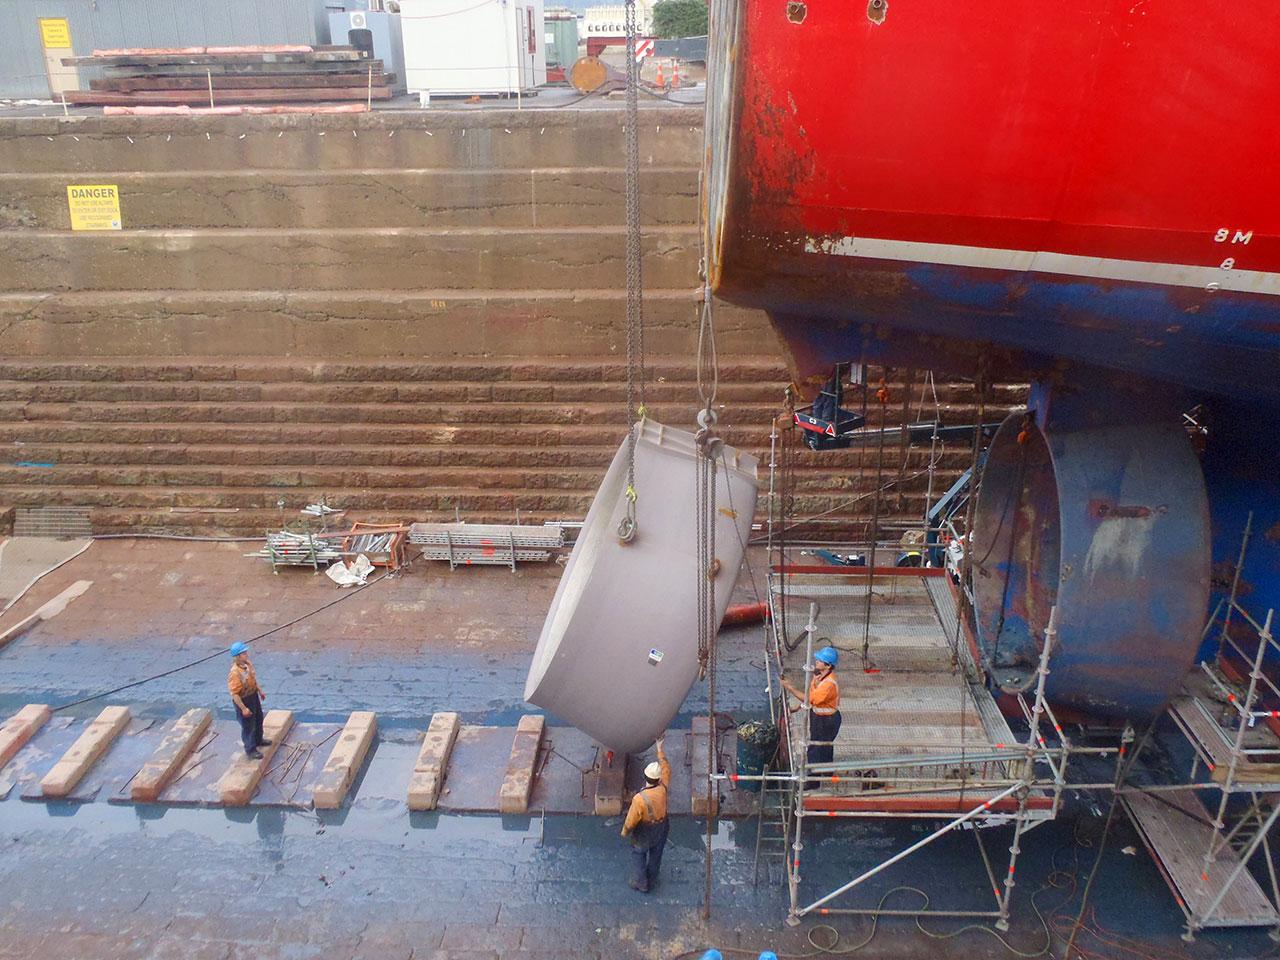 Trawler - Amaltal Columbia - nozzle replacement